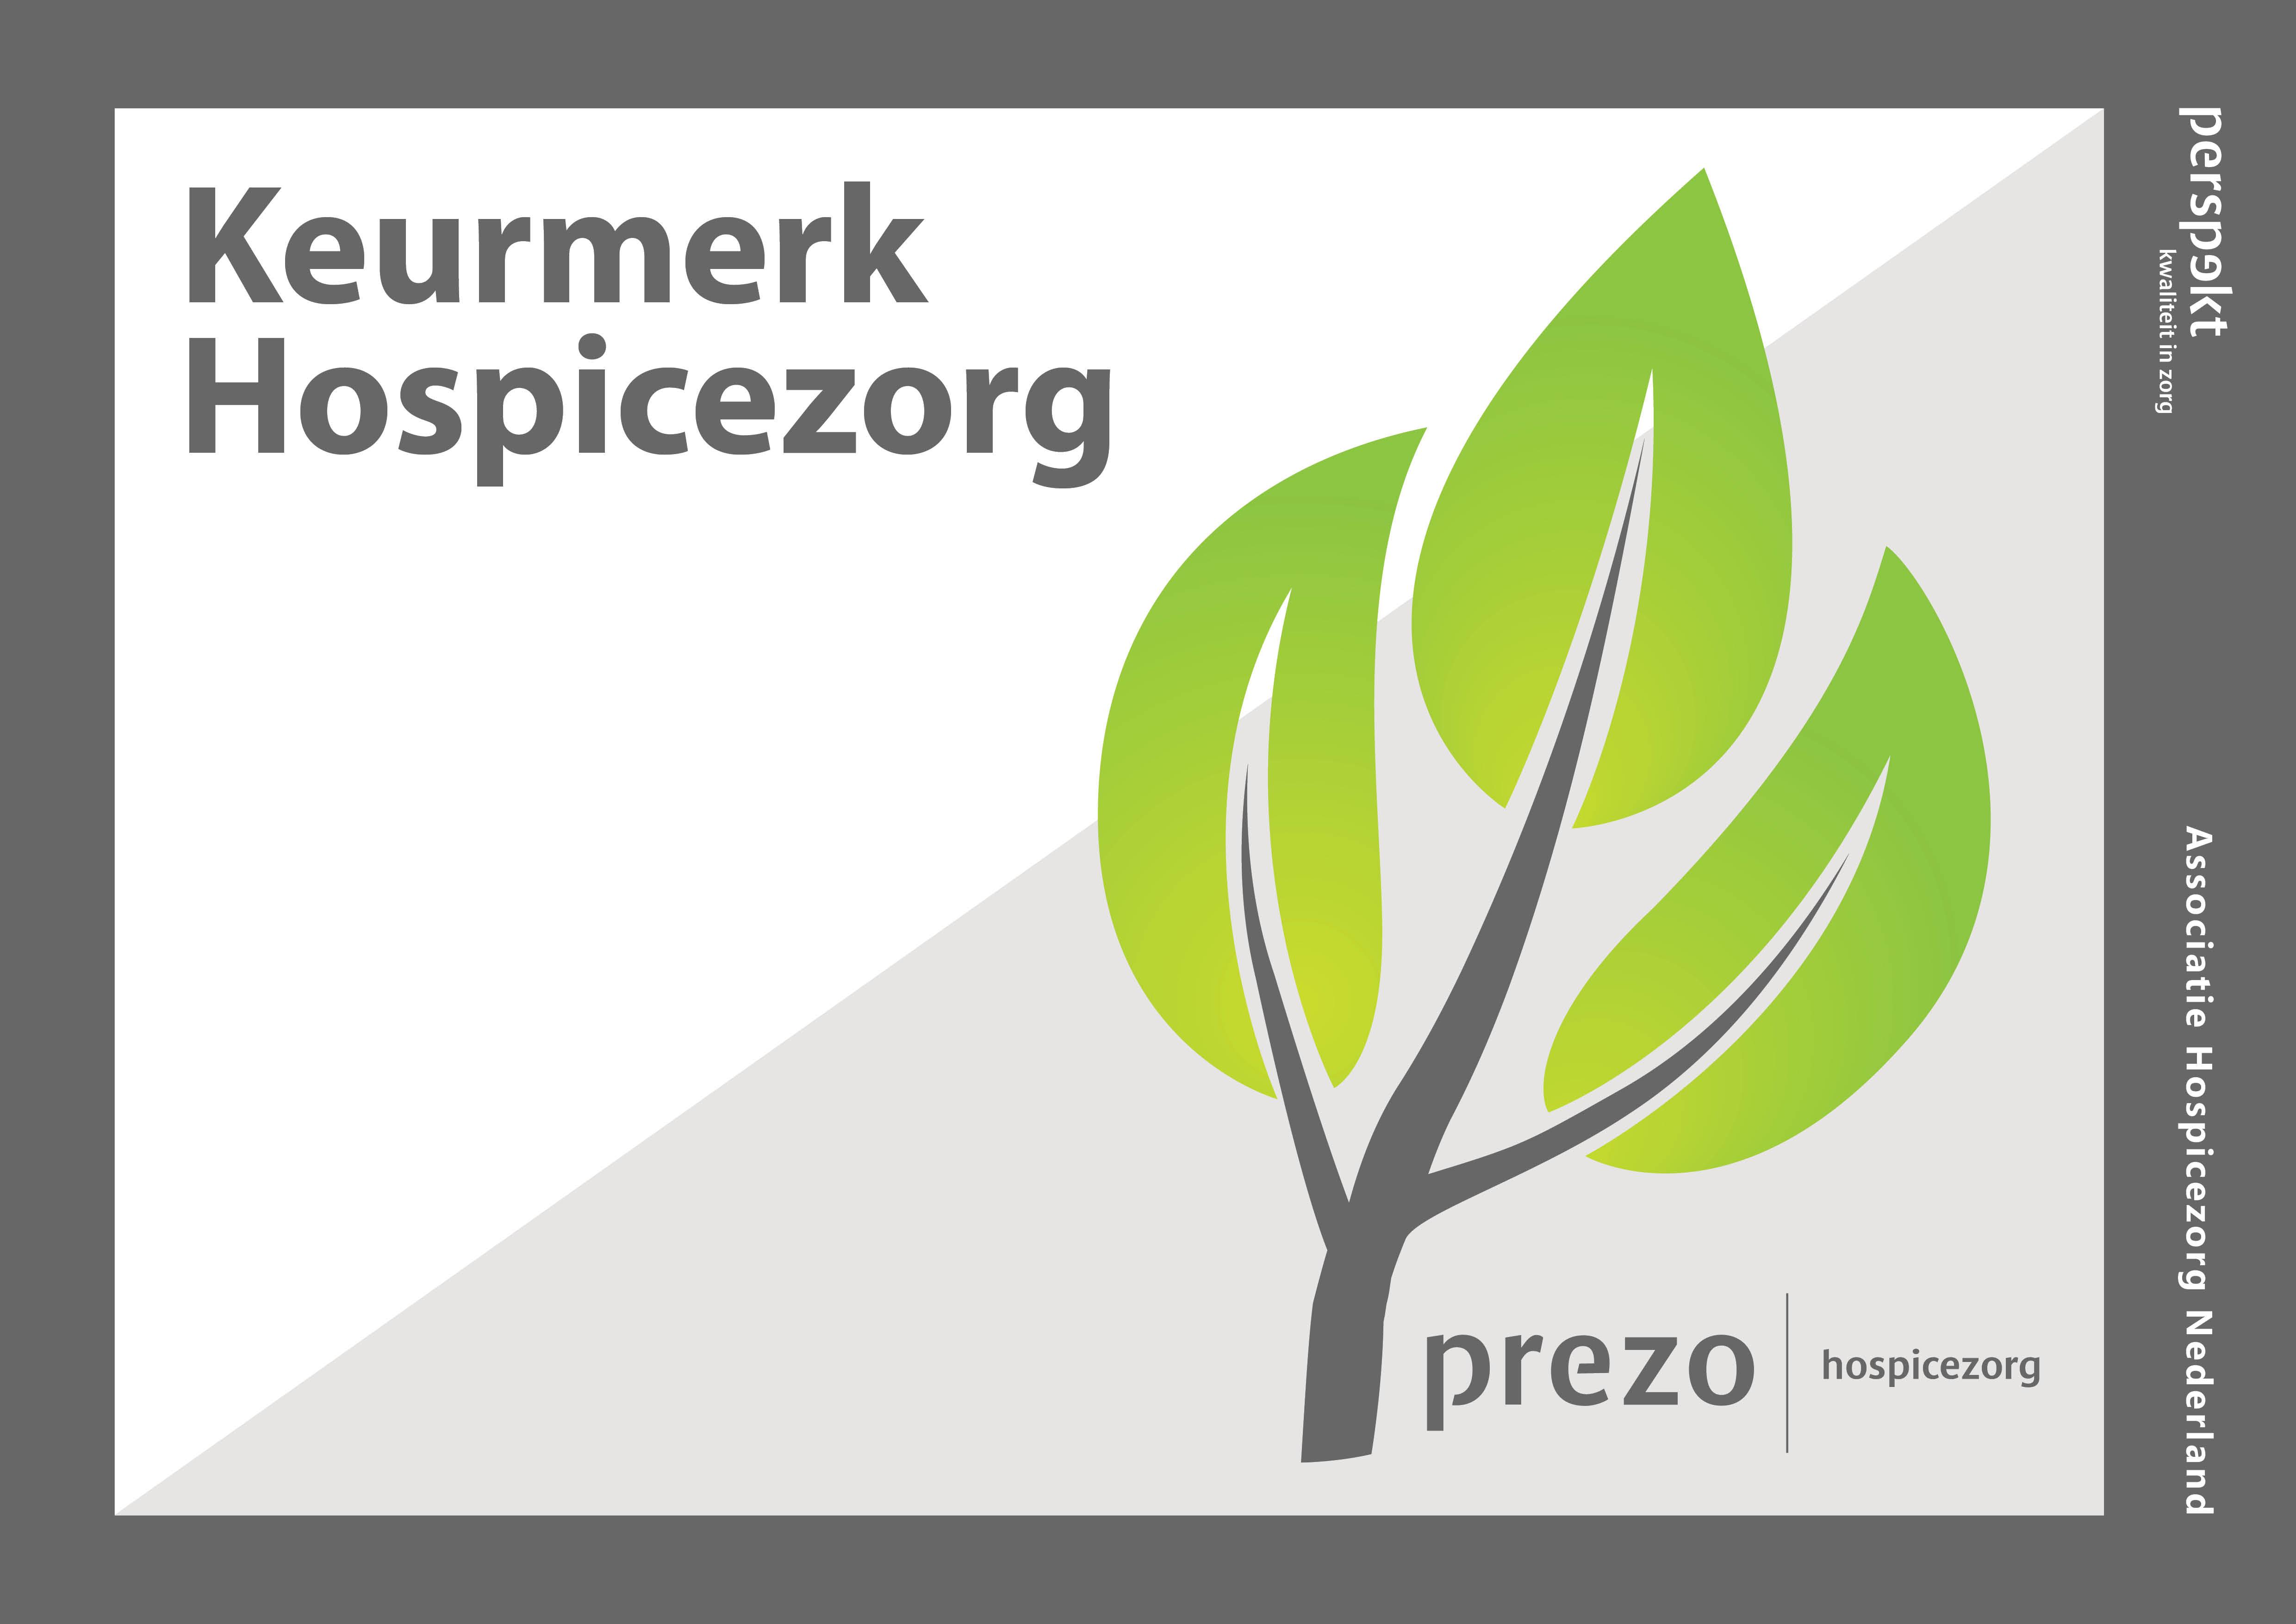 prezo | hospicezorg